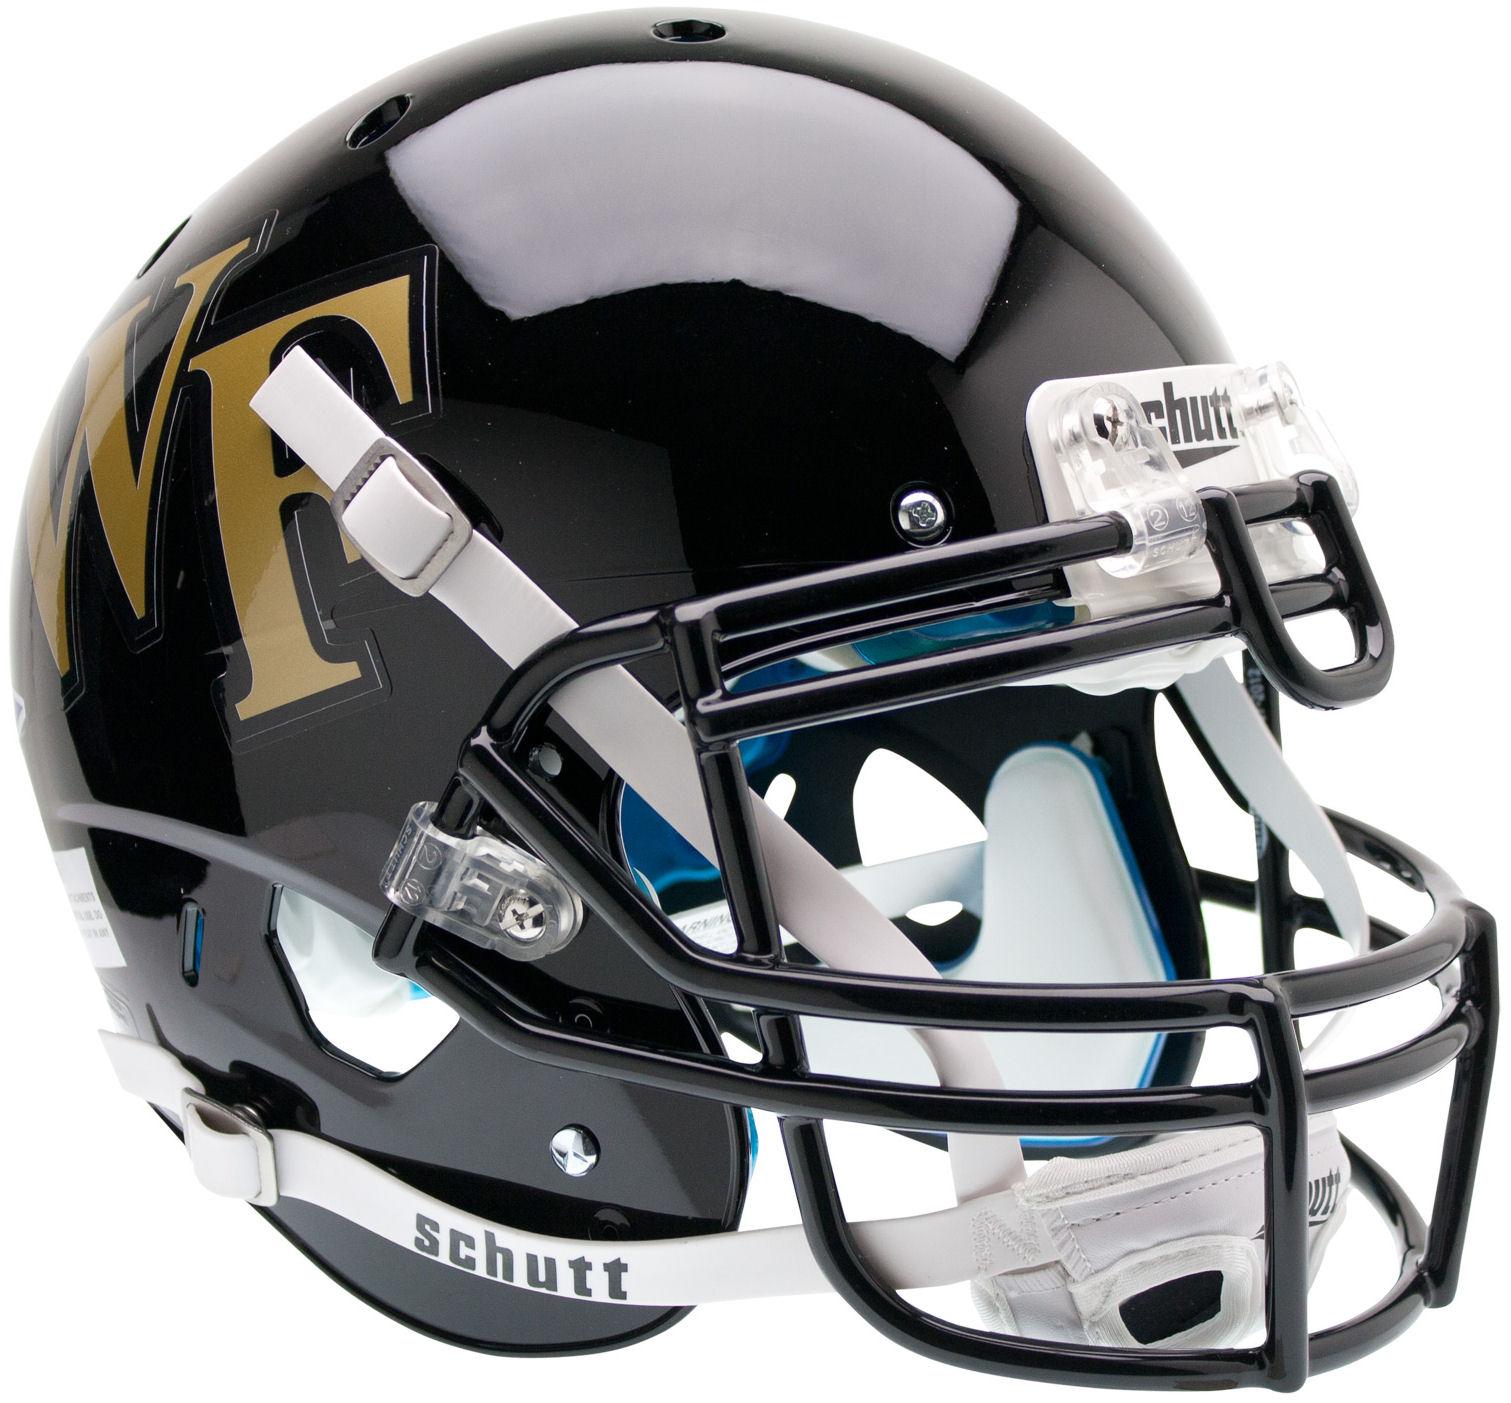 Wake Forest Demon Deacons Authentic Schutt Xp Full Size Helmet With Images Football Helmets Philadelphia Eagles Helmet Football